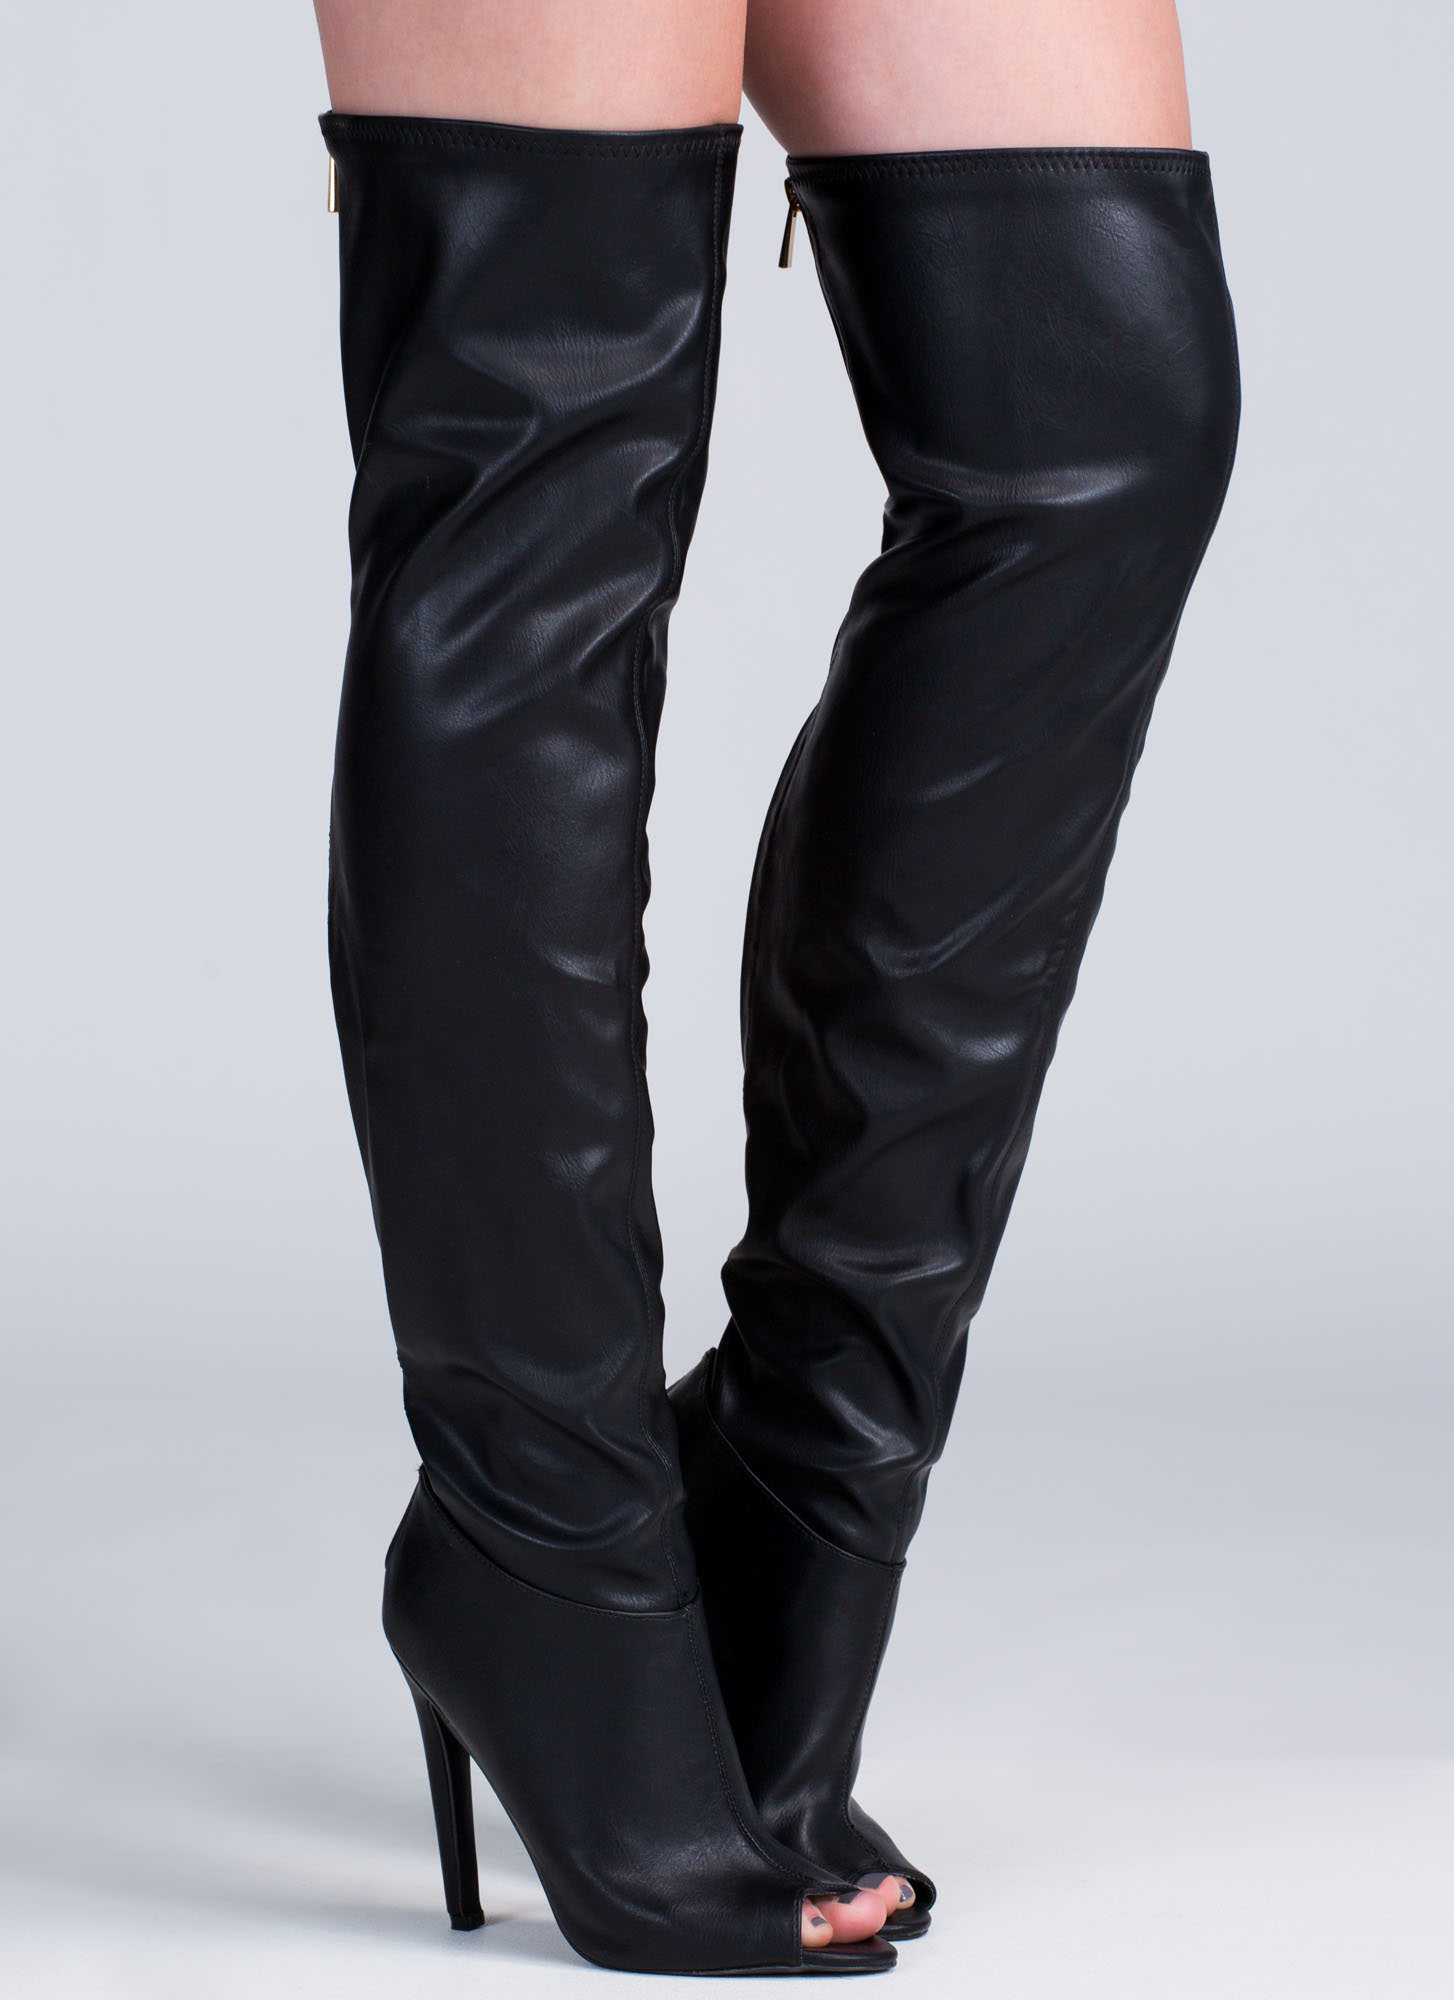 6897b7dd4fe Pull Up Thigh-High Peep-Toe Boots BONE BLACK - GoJane.com